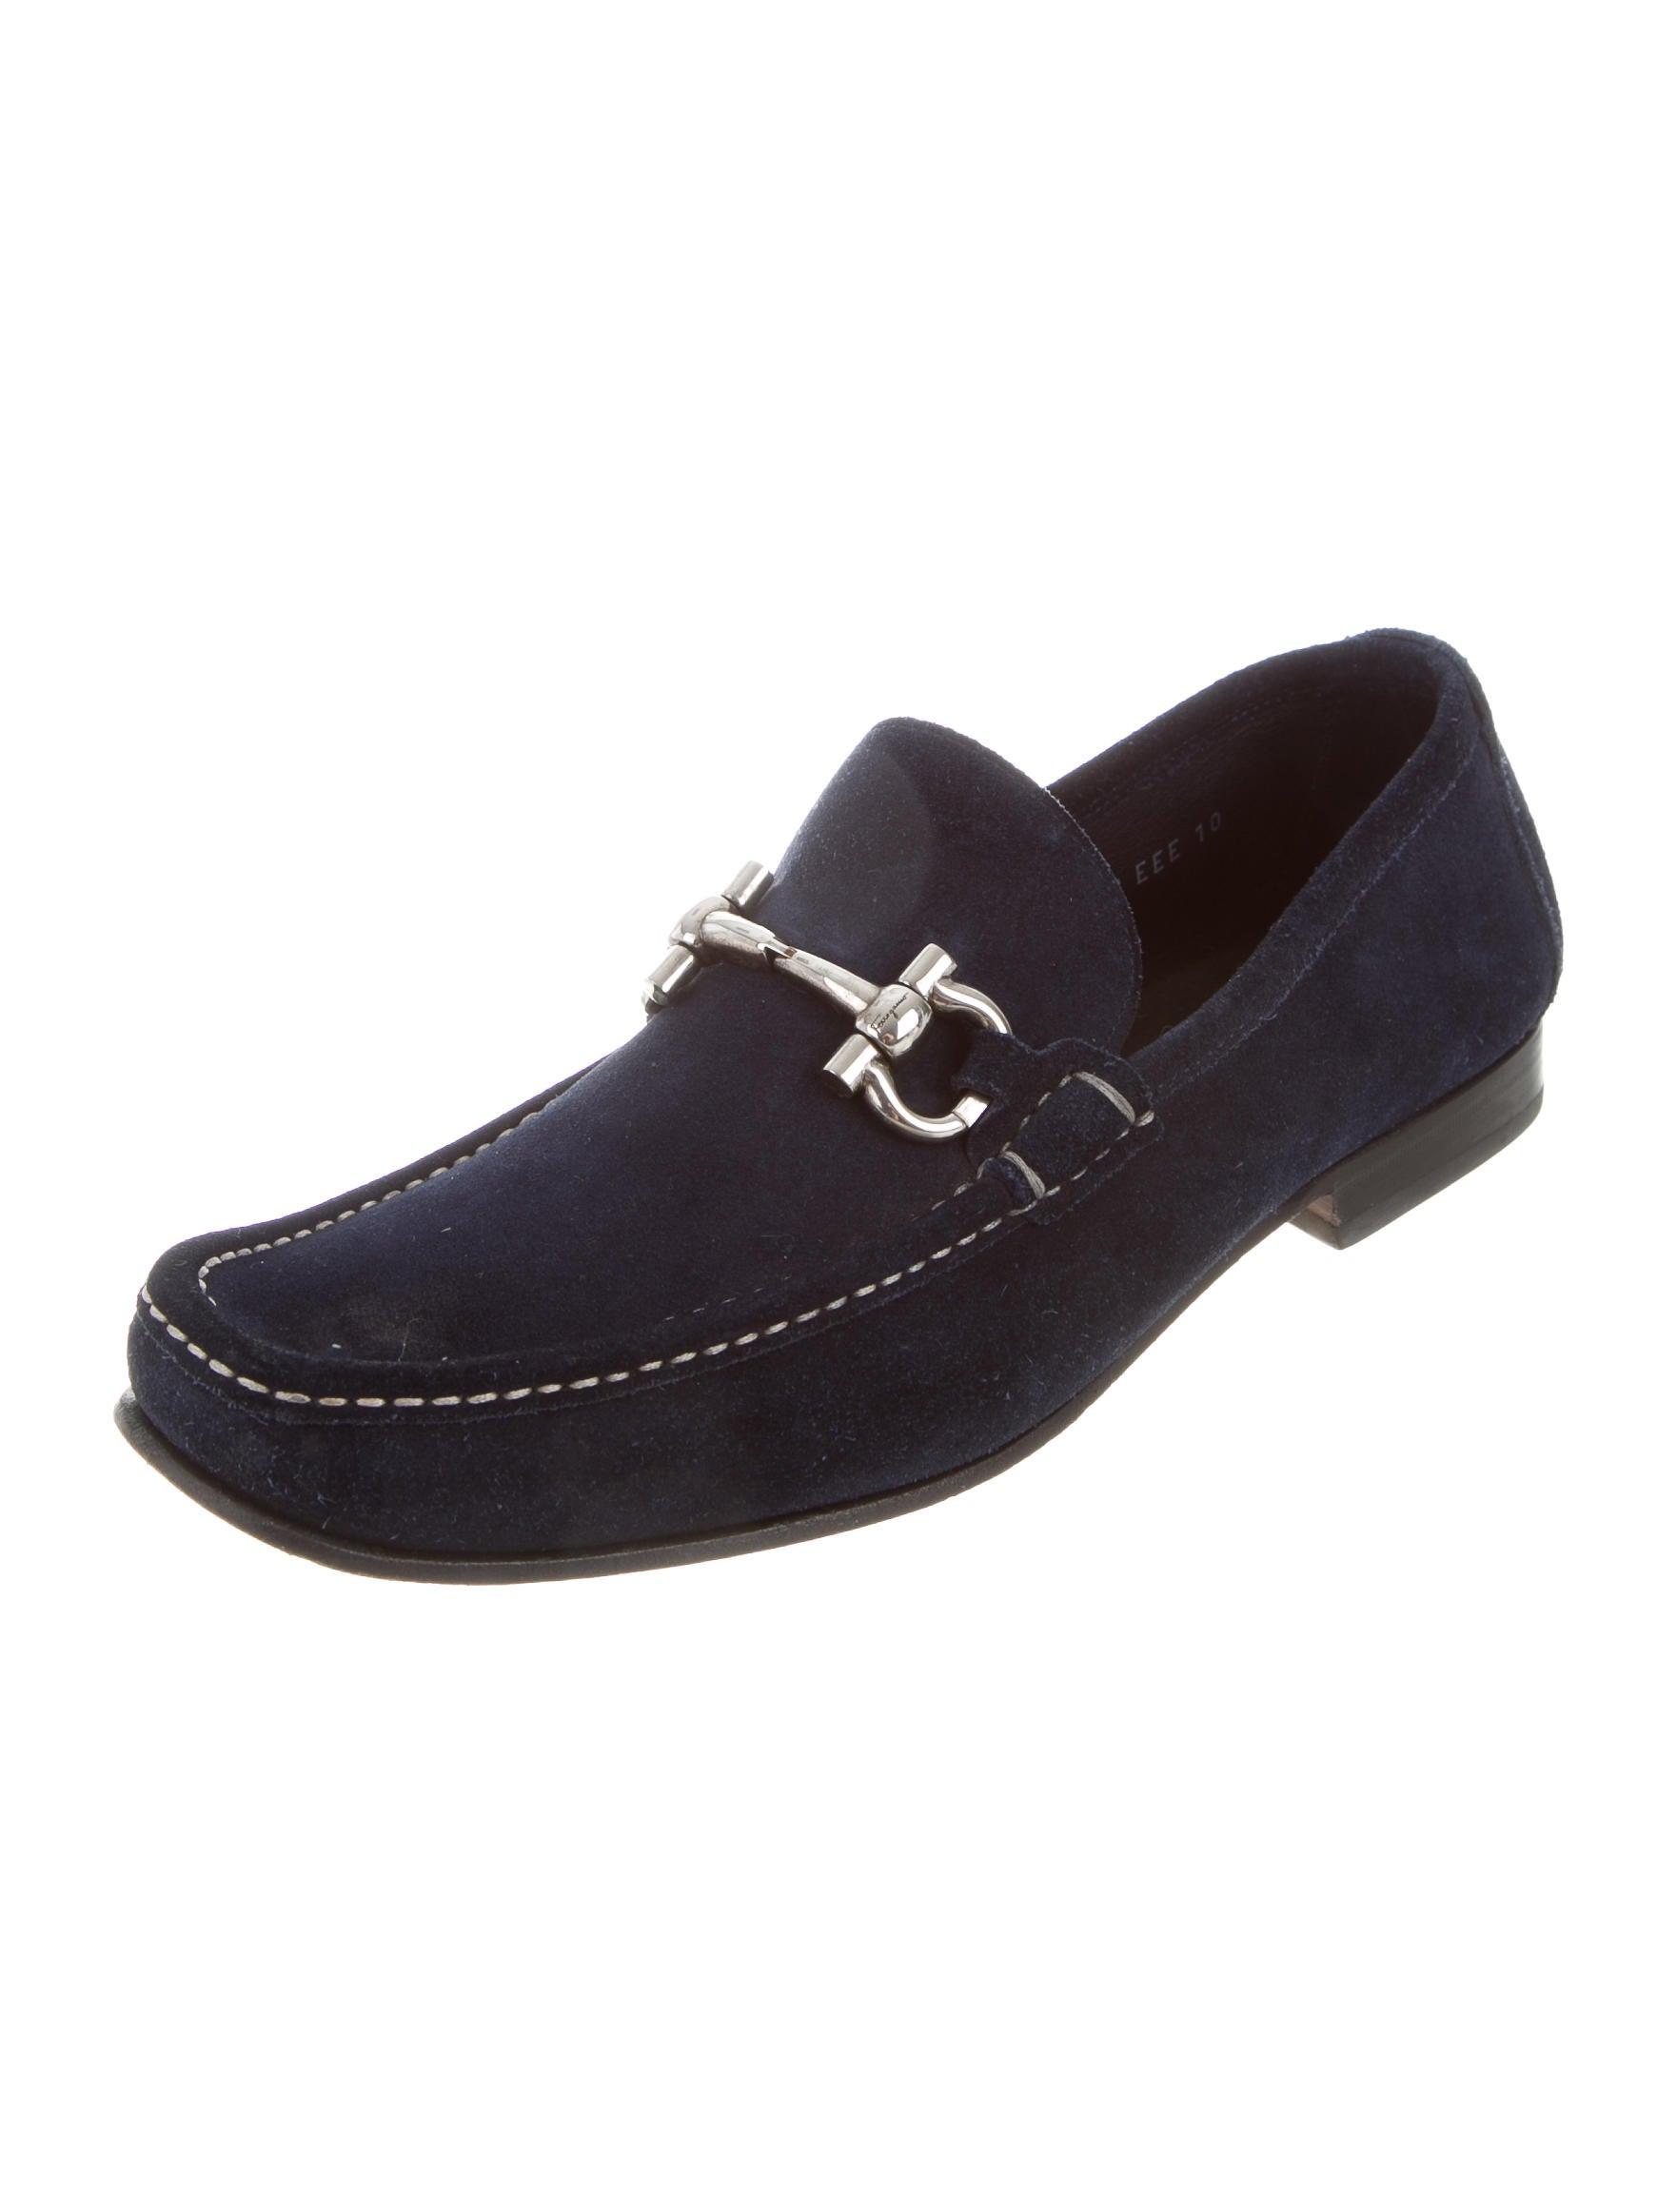 Salvatore Ferragamo Shoes Size